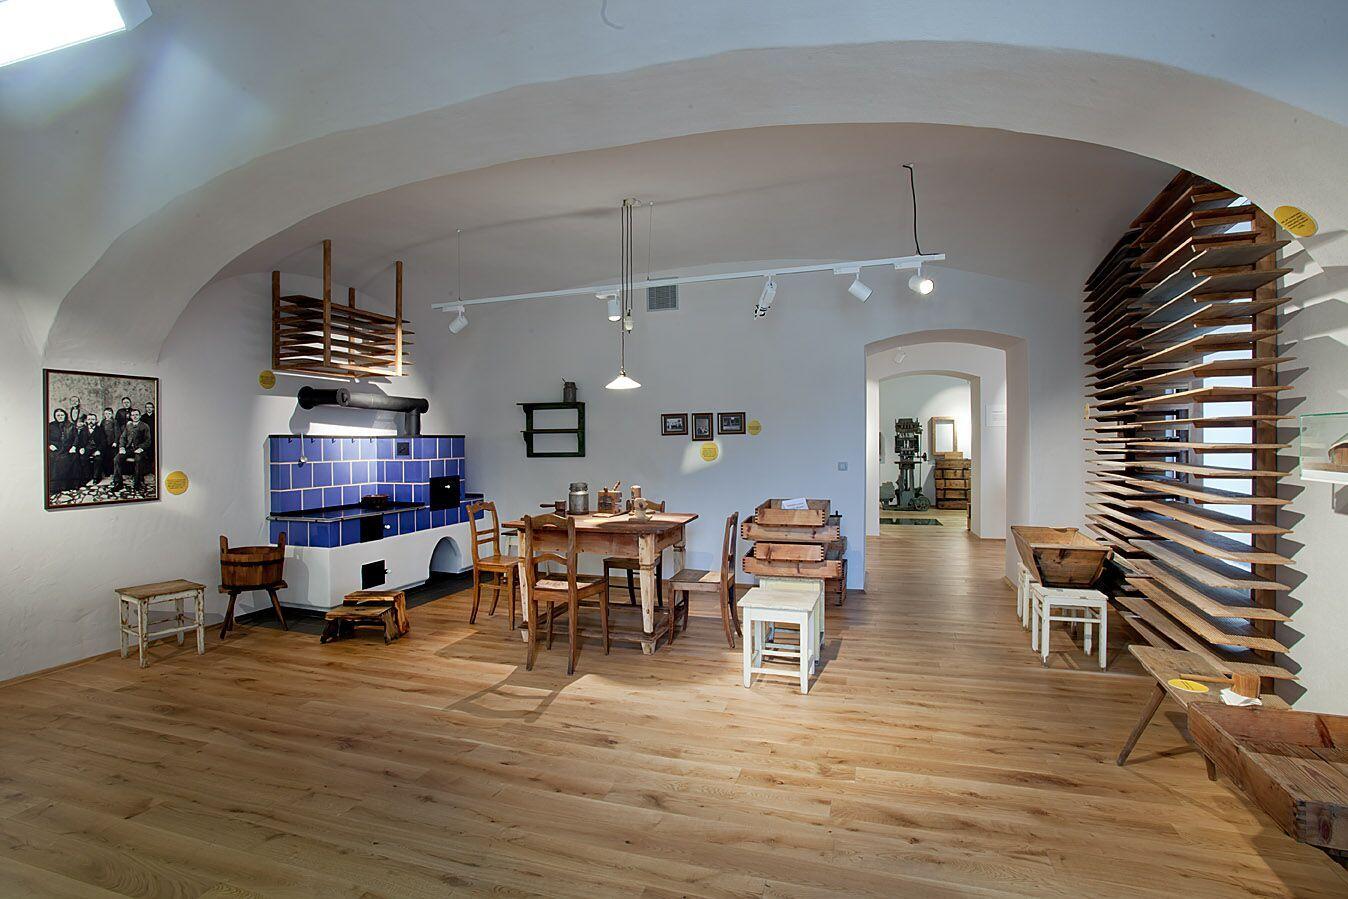 Muzeum tvaružků Loštice